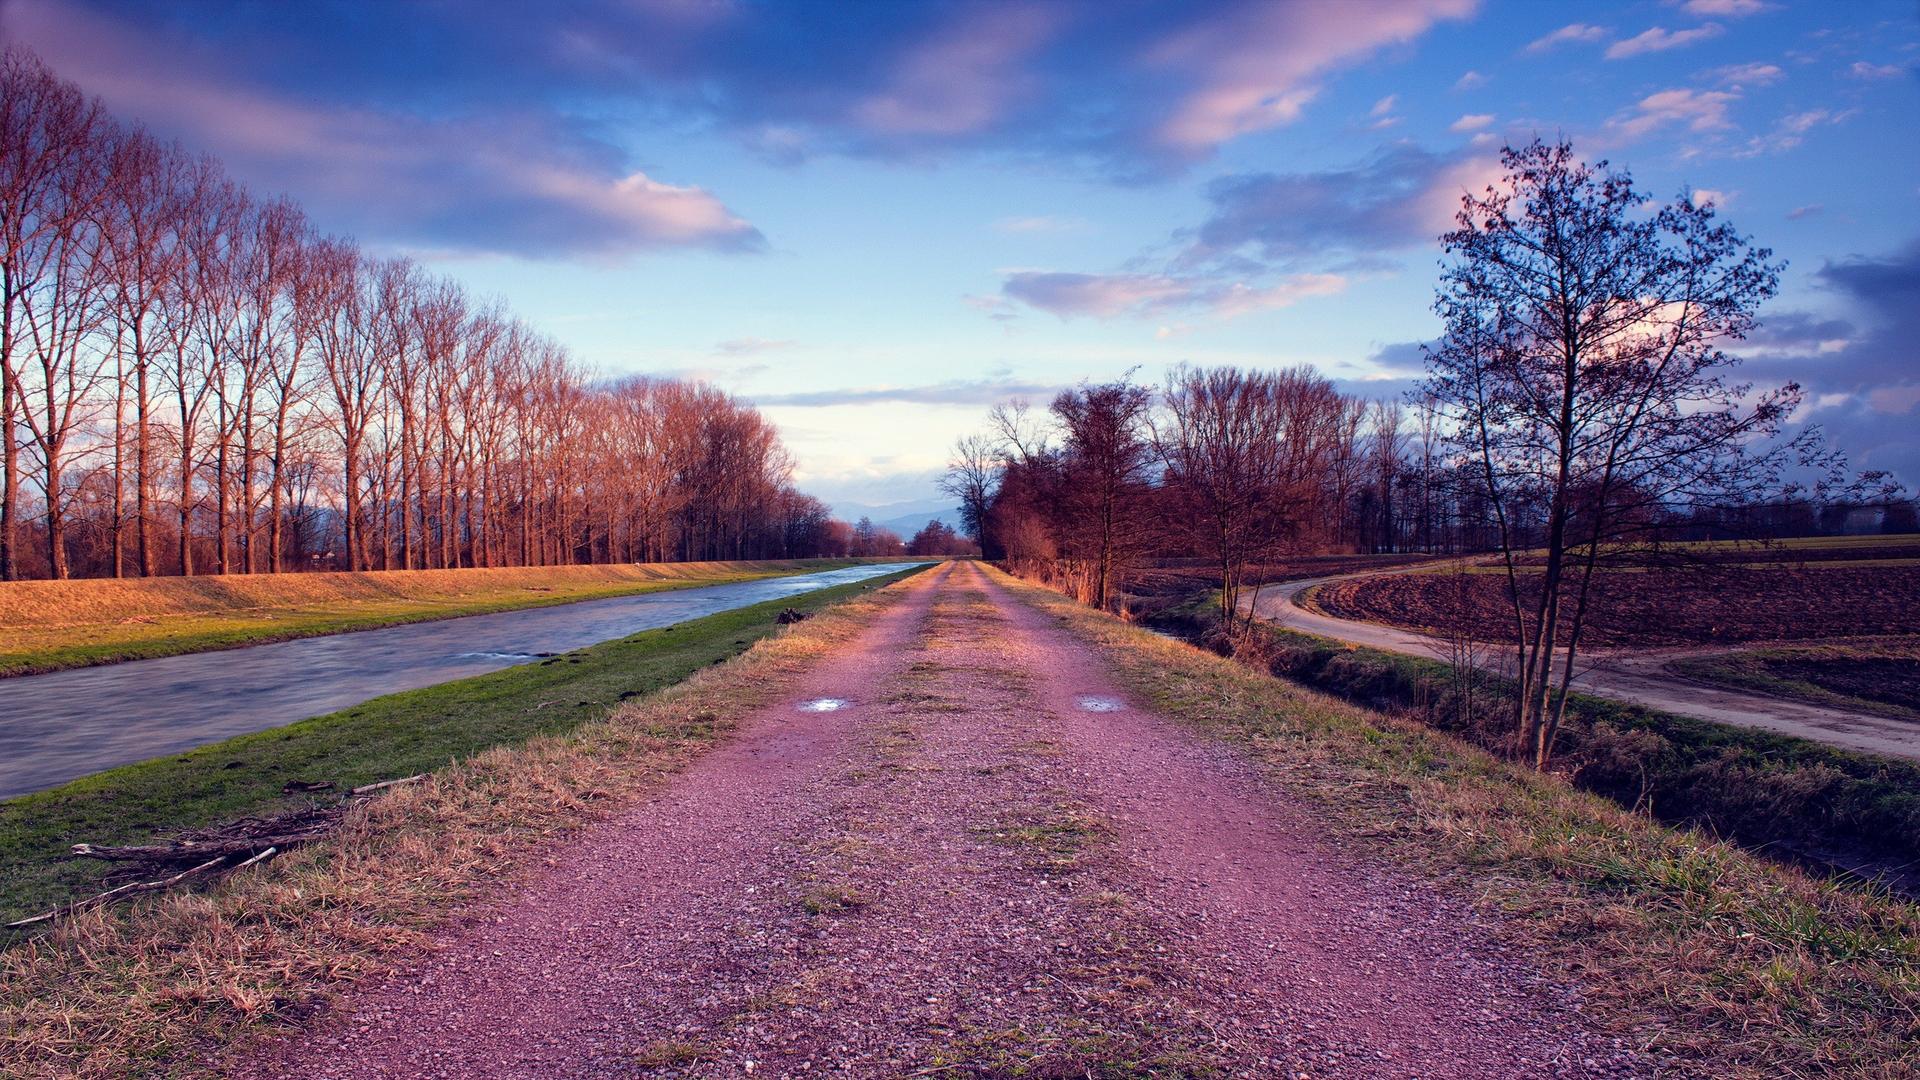 pink gravel road wallpaper 43705